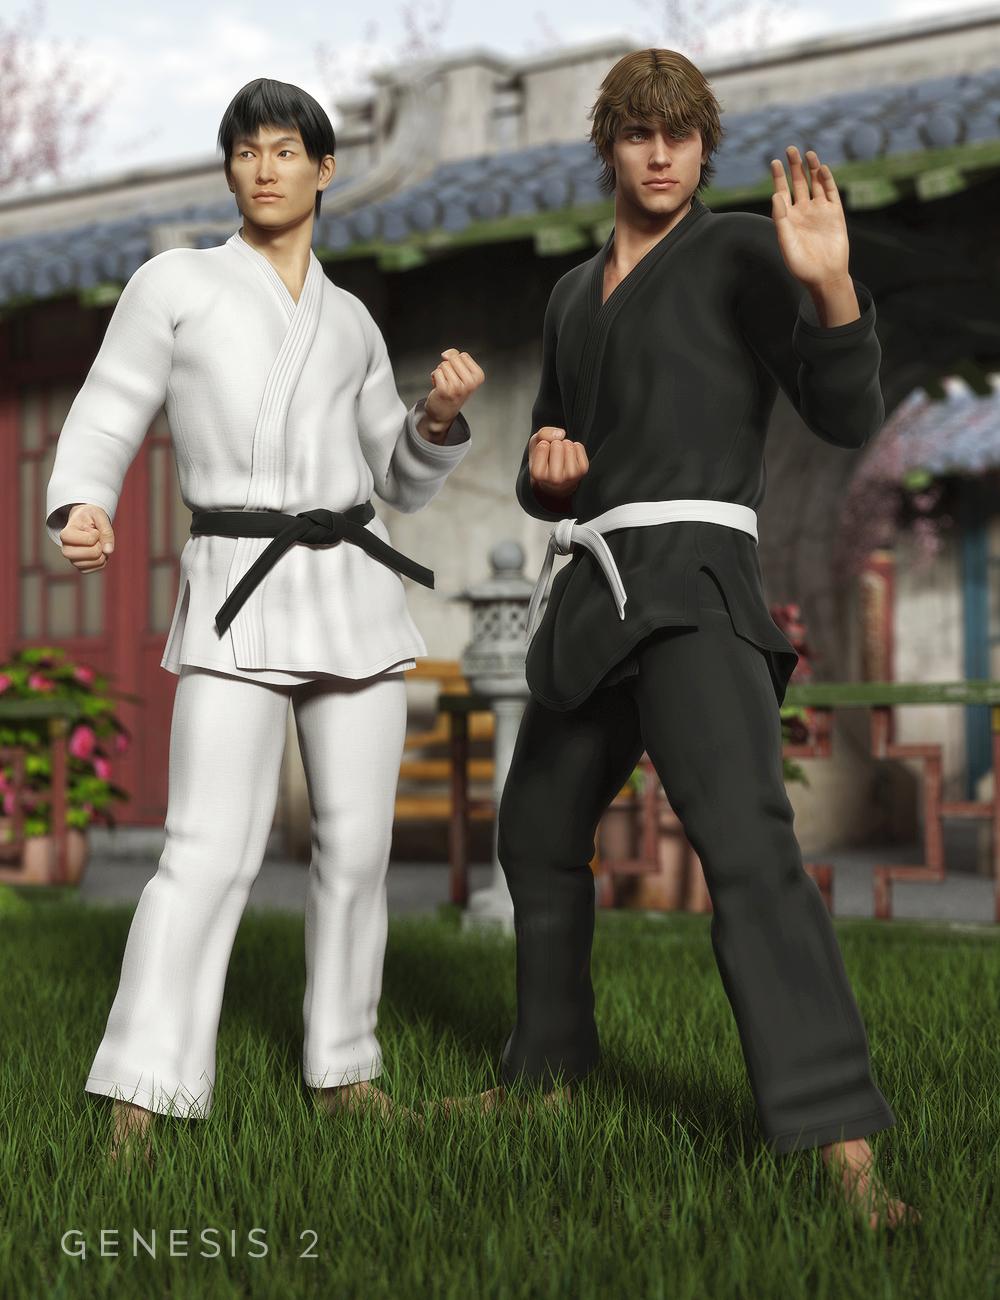 Karate Gi for Genesis 2 Male(s) by: DemonicaEvilius, 3D Models by Daz 3D